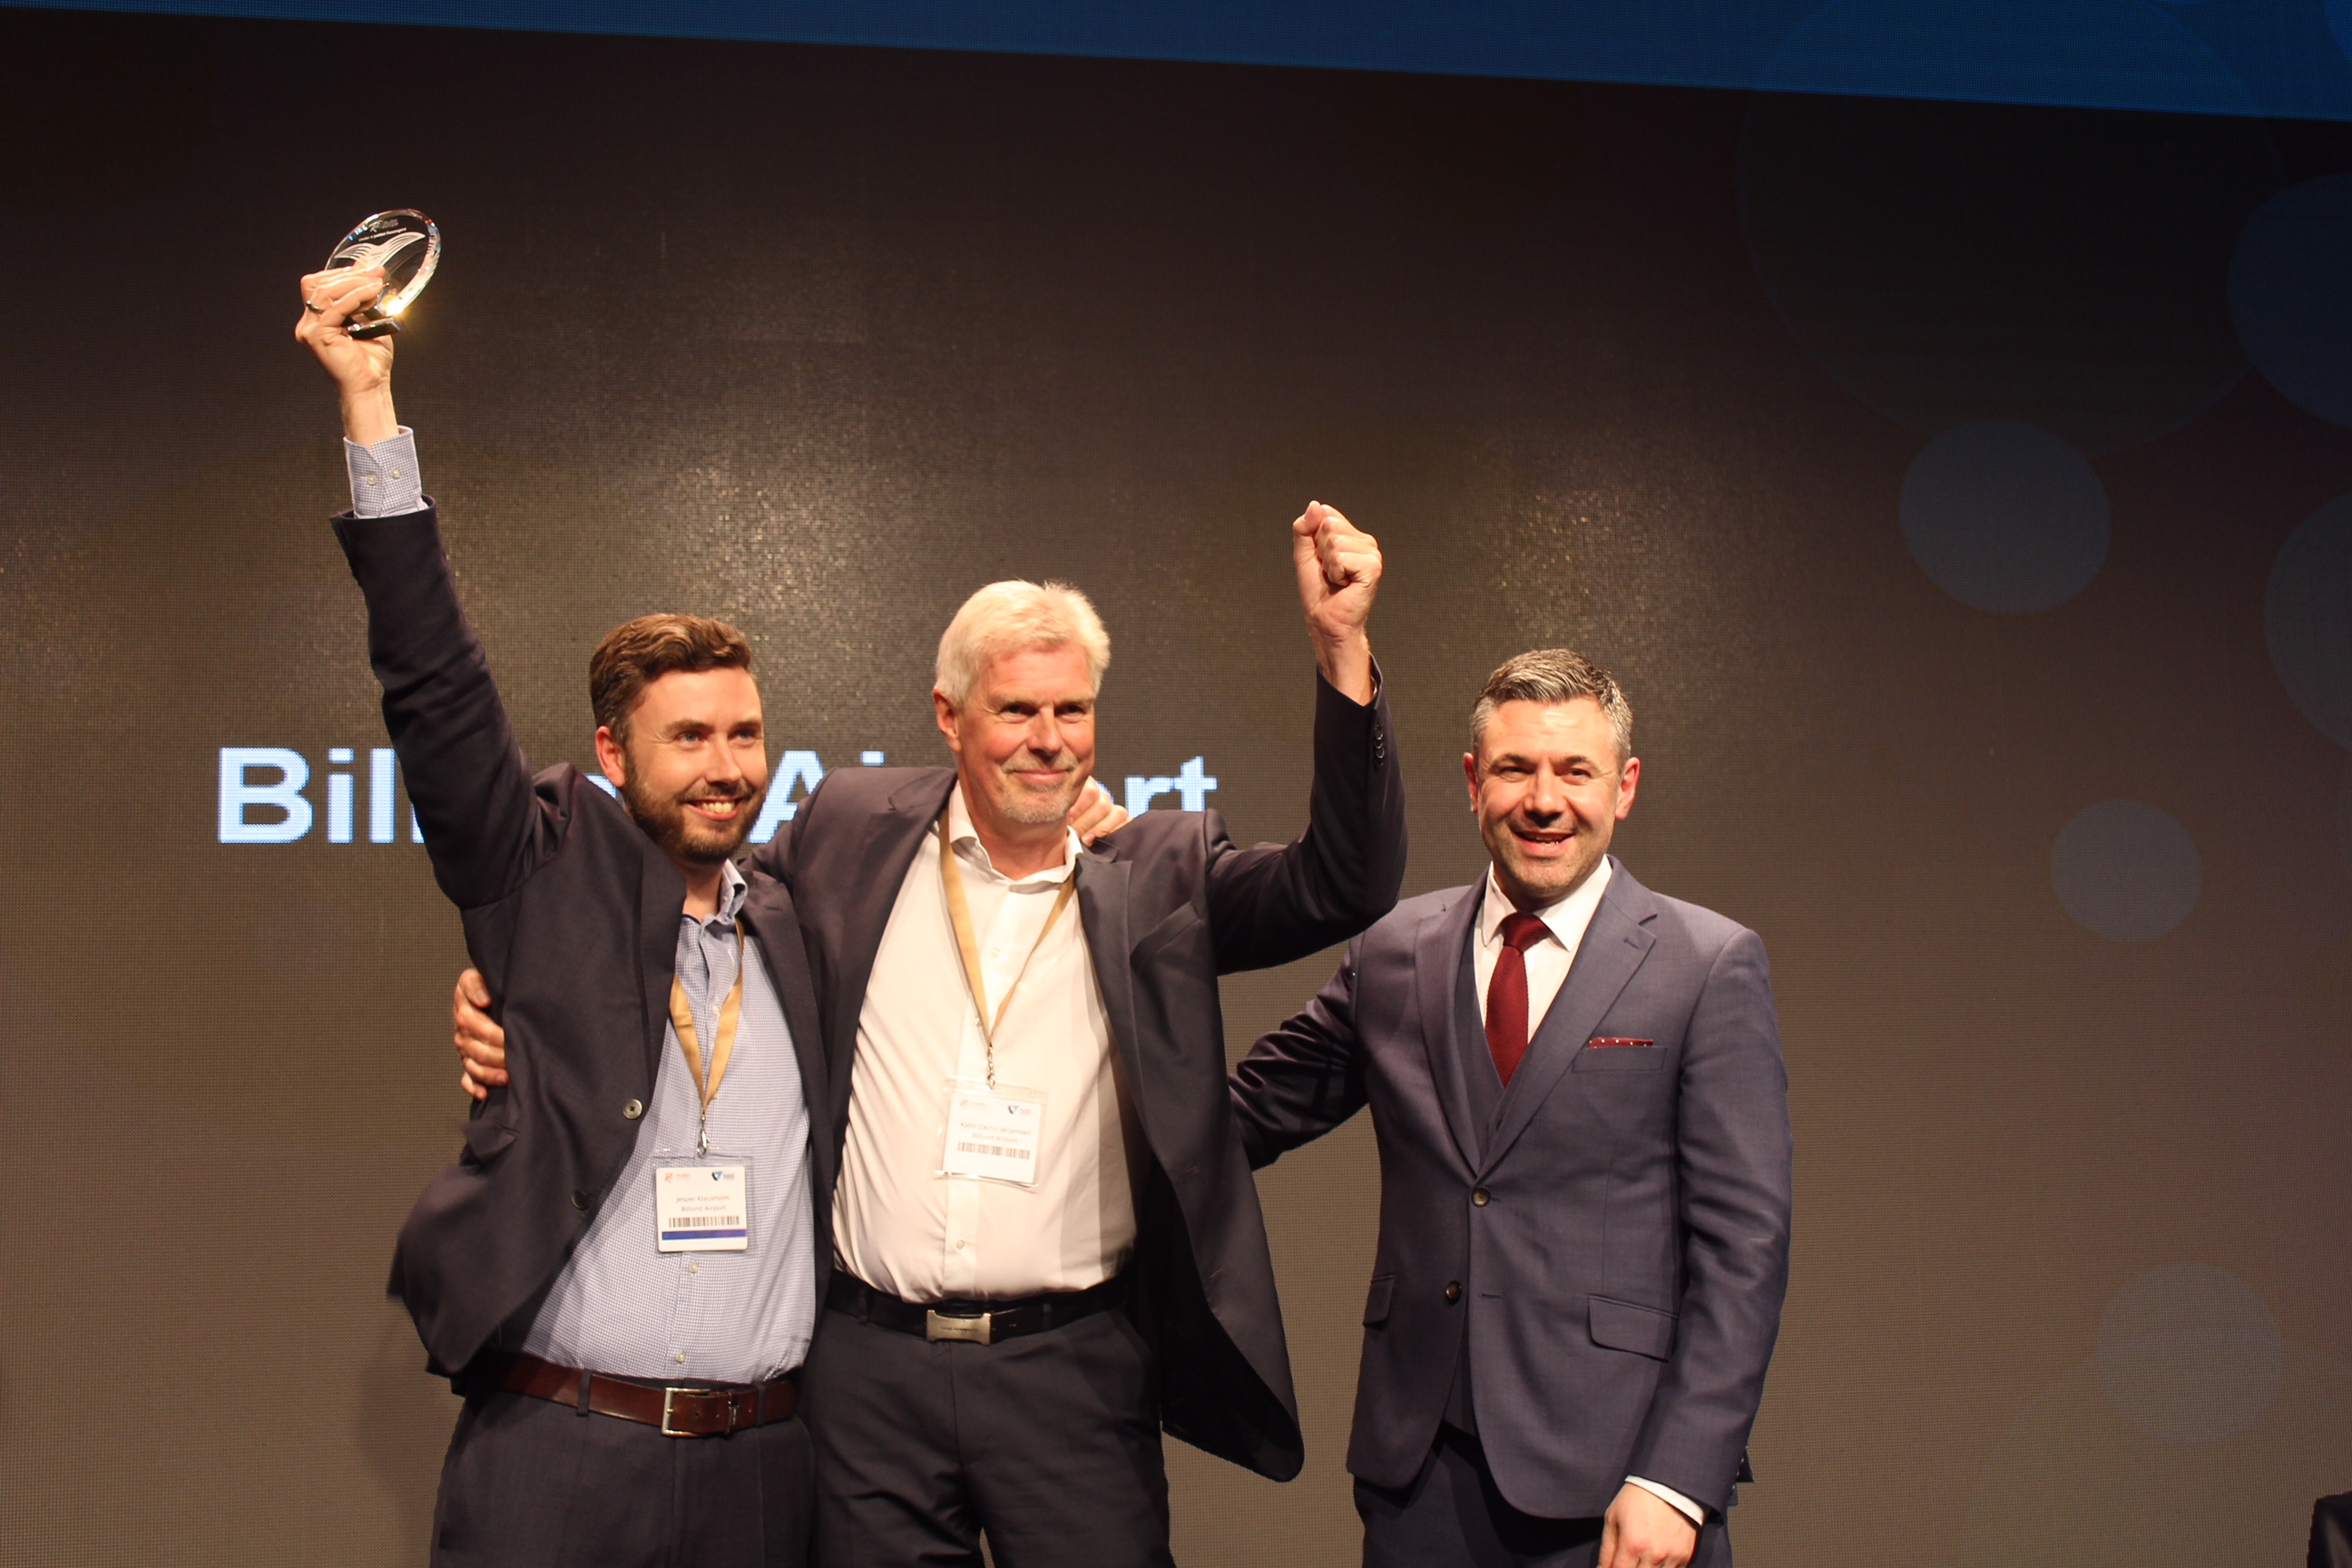 Jesper Klausholm (t.v) og Kjeld Zacho Jørgensen modtager prisen ved Routes Europe 2018. (Foto: Marc Watkins)